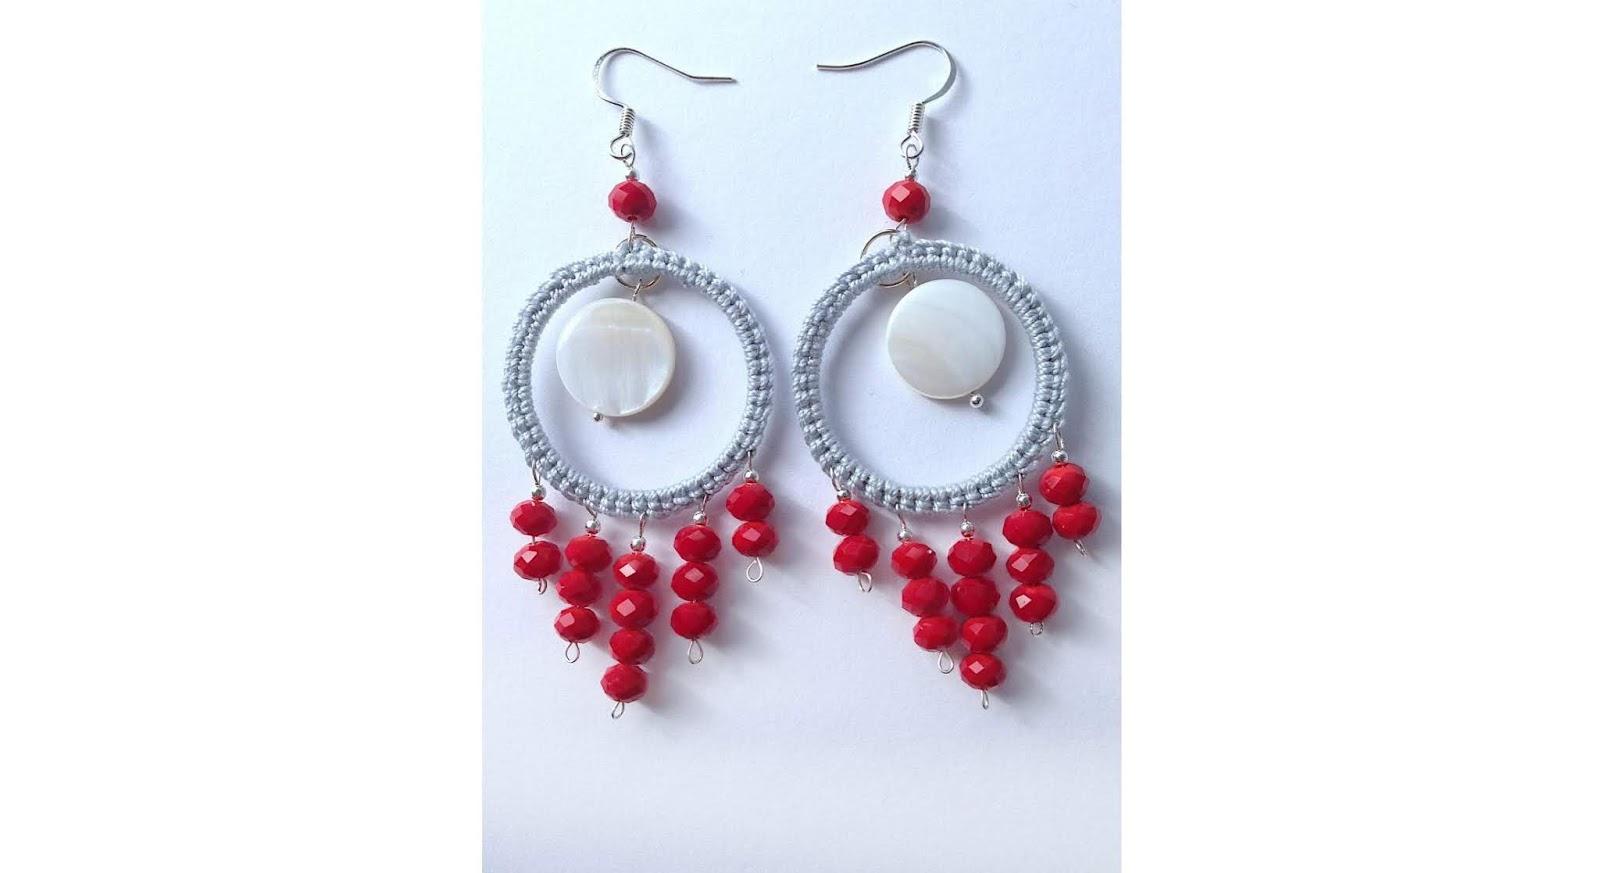 crochet boho chic earrings